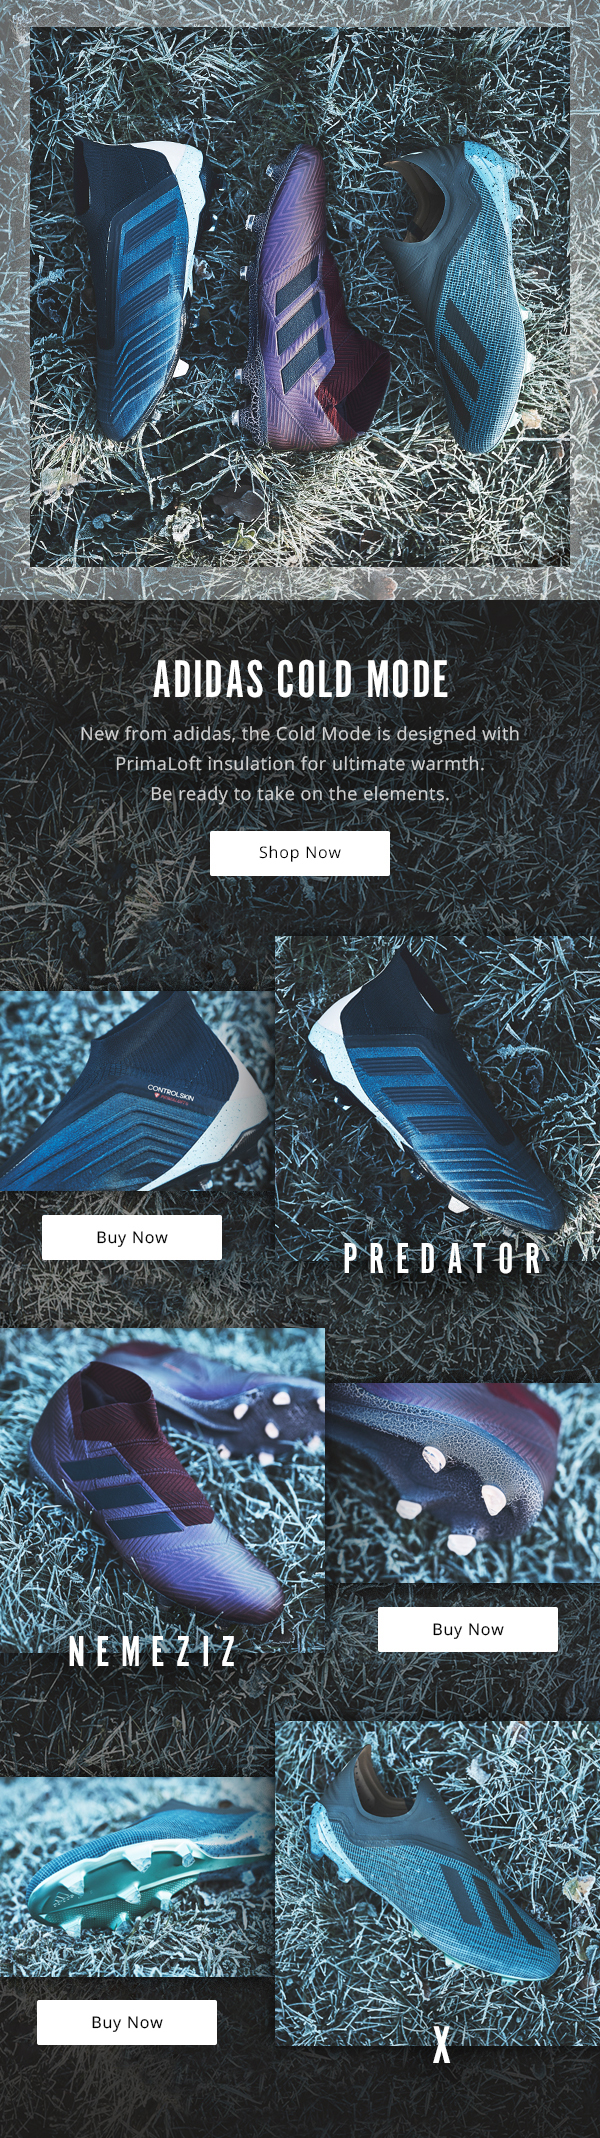 adidasColdMode.jpg